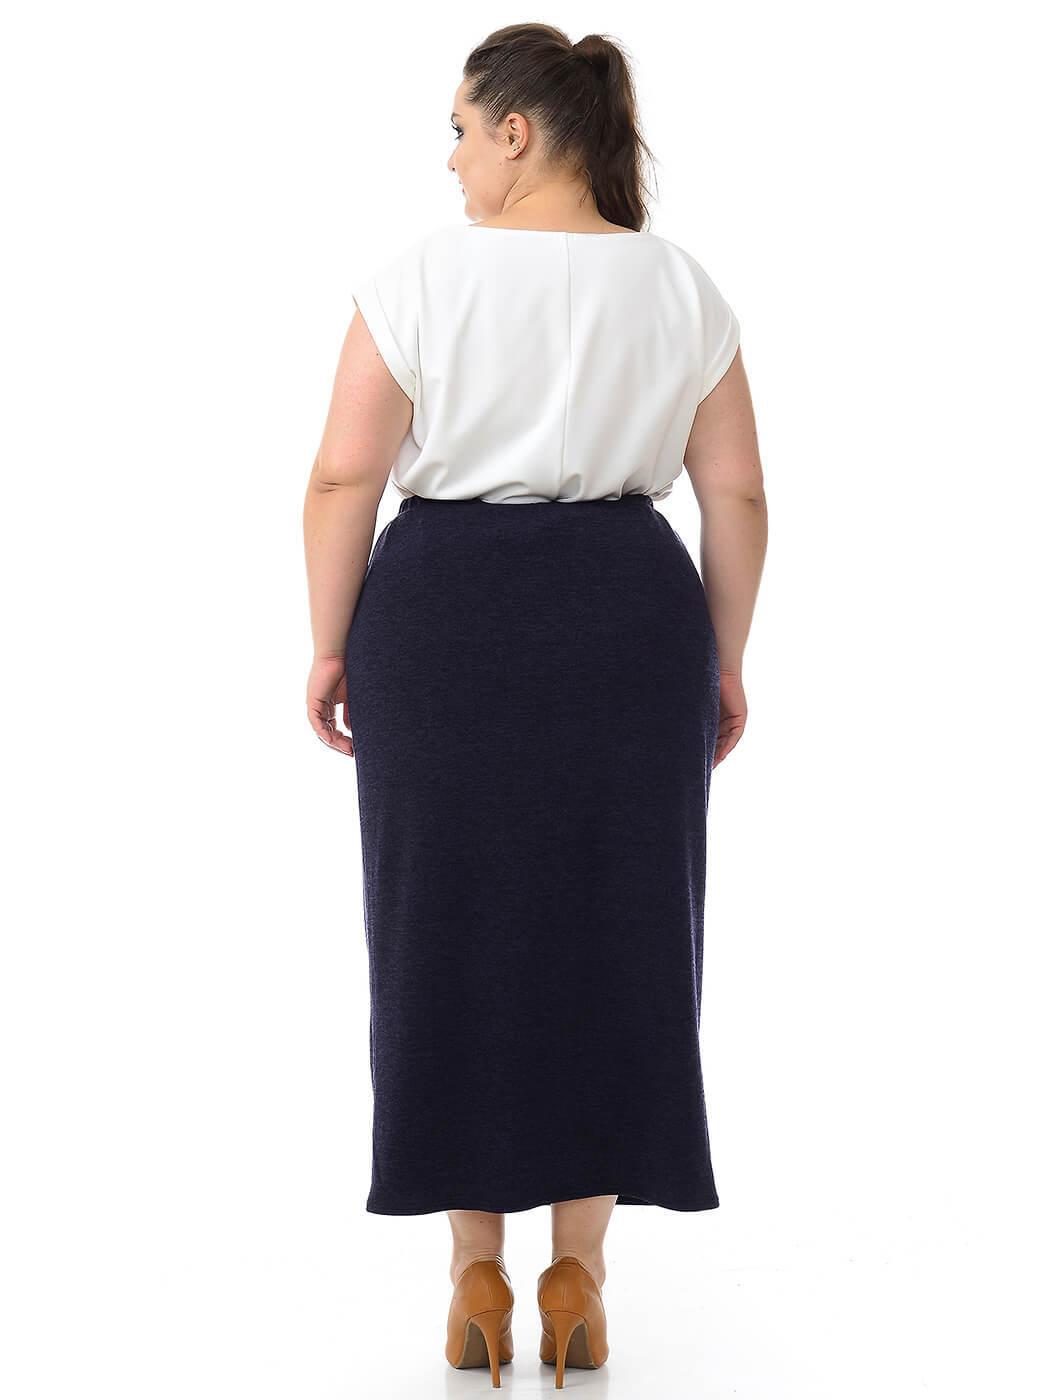 Длинная юбка Ангора темно-синяя